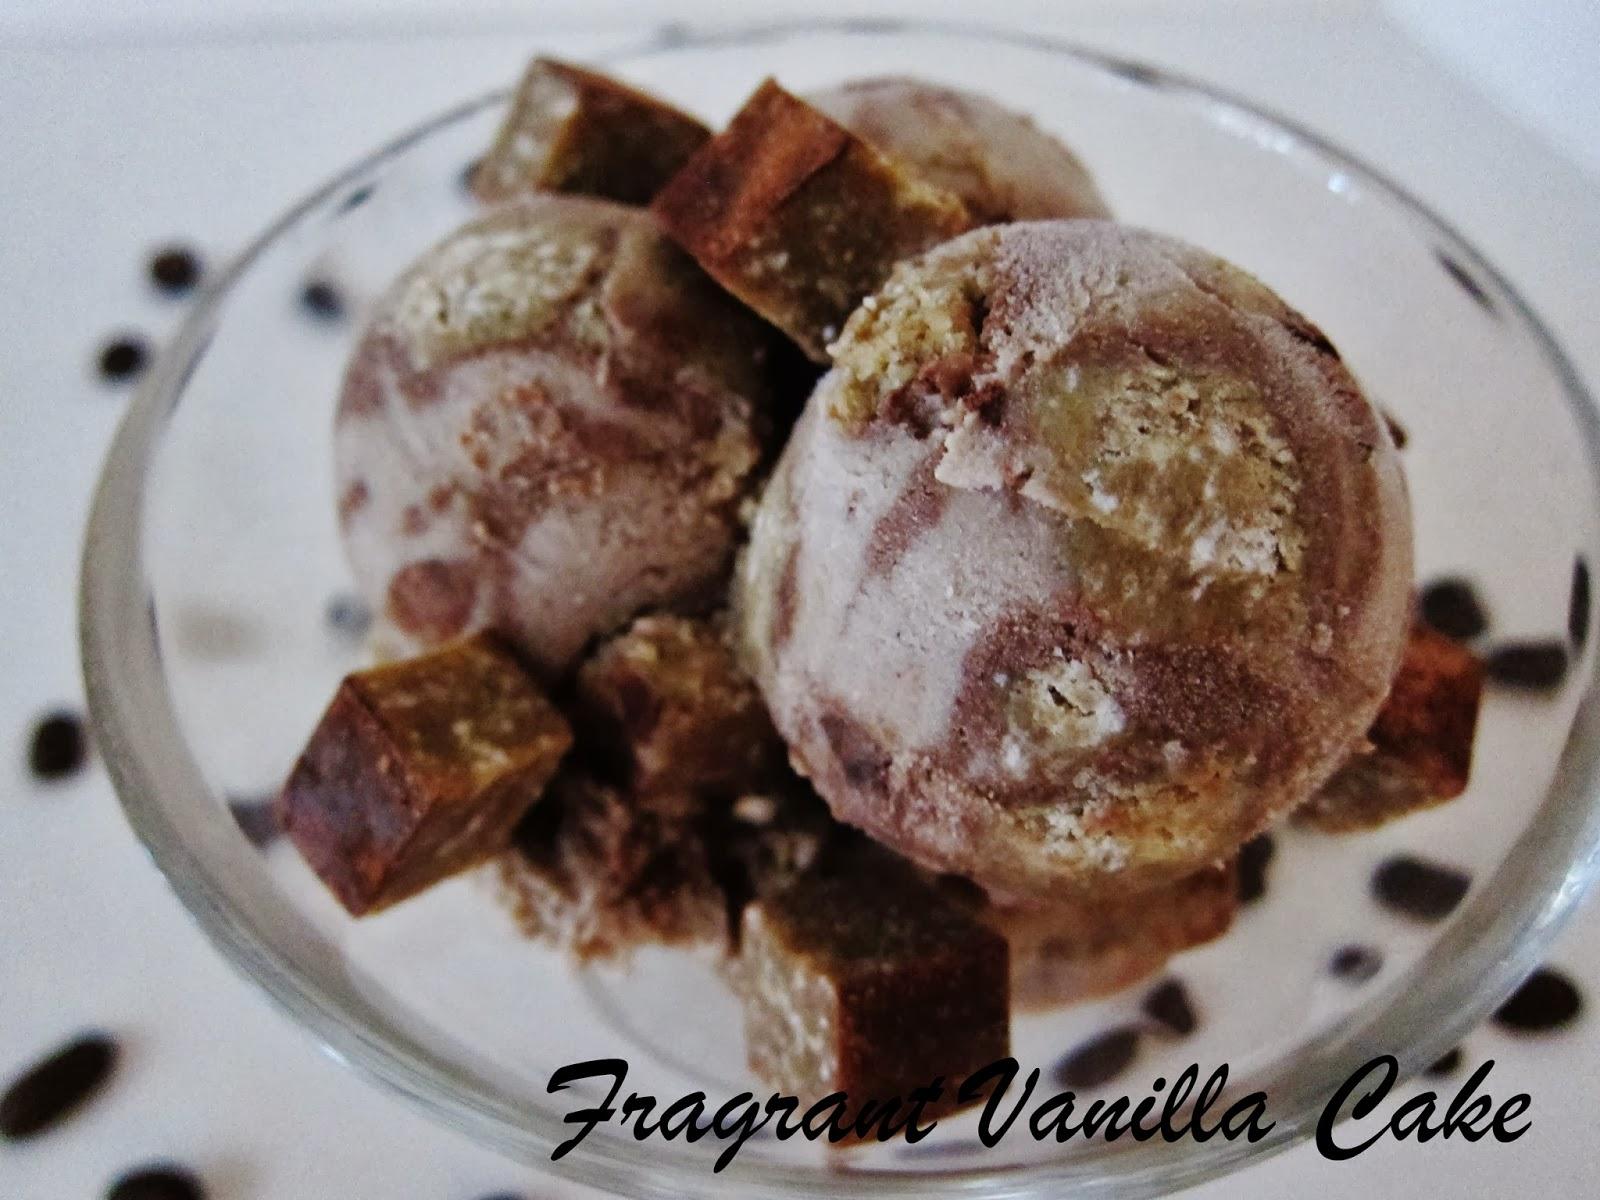 ... tiramisu dip tiramisu tiramisu ice cream cake tiramisu ice cream cake